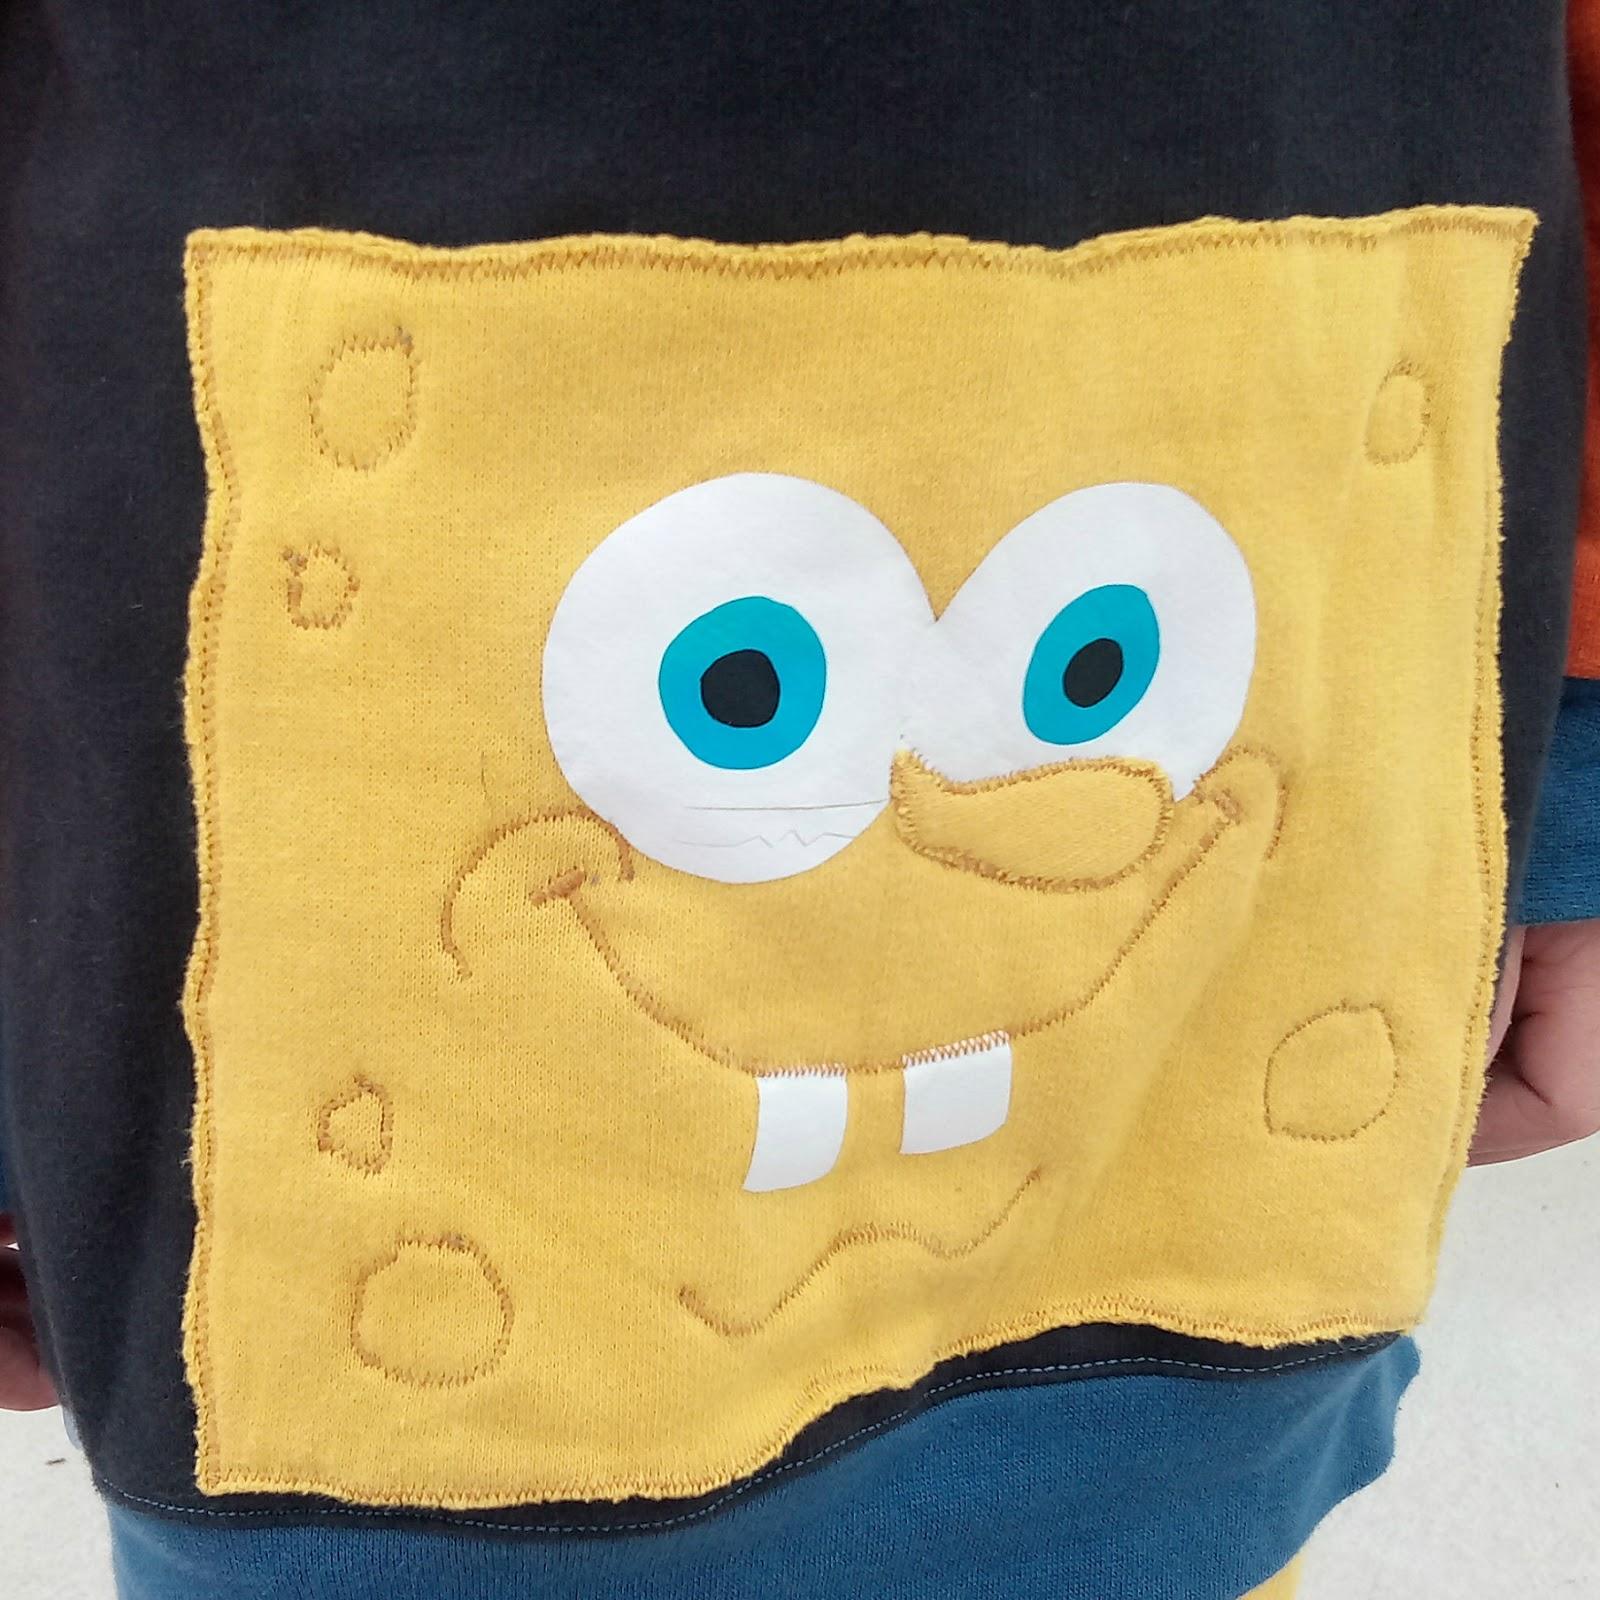 Sudadera bob esponja handmade